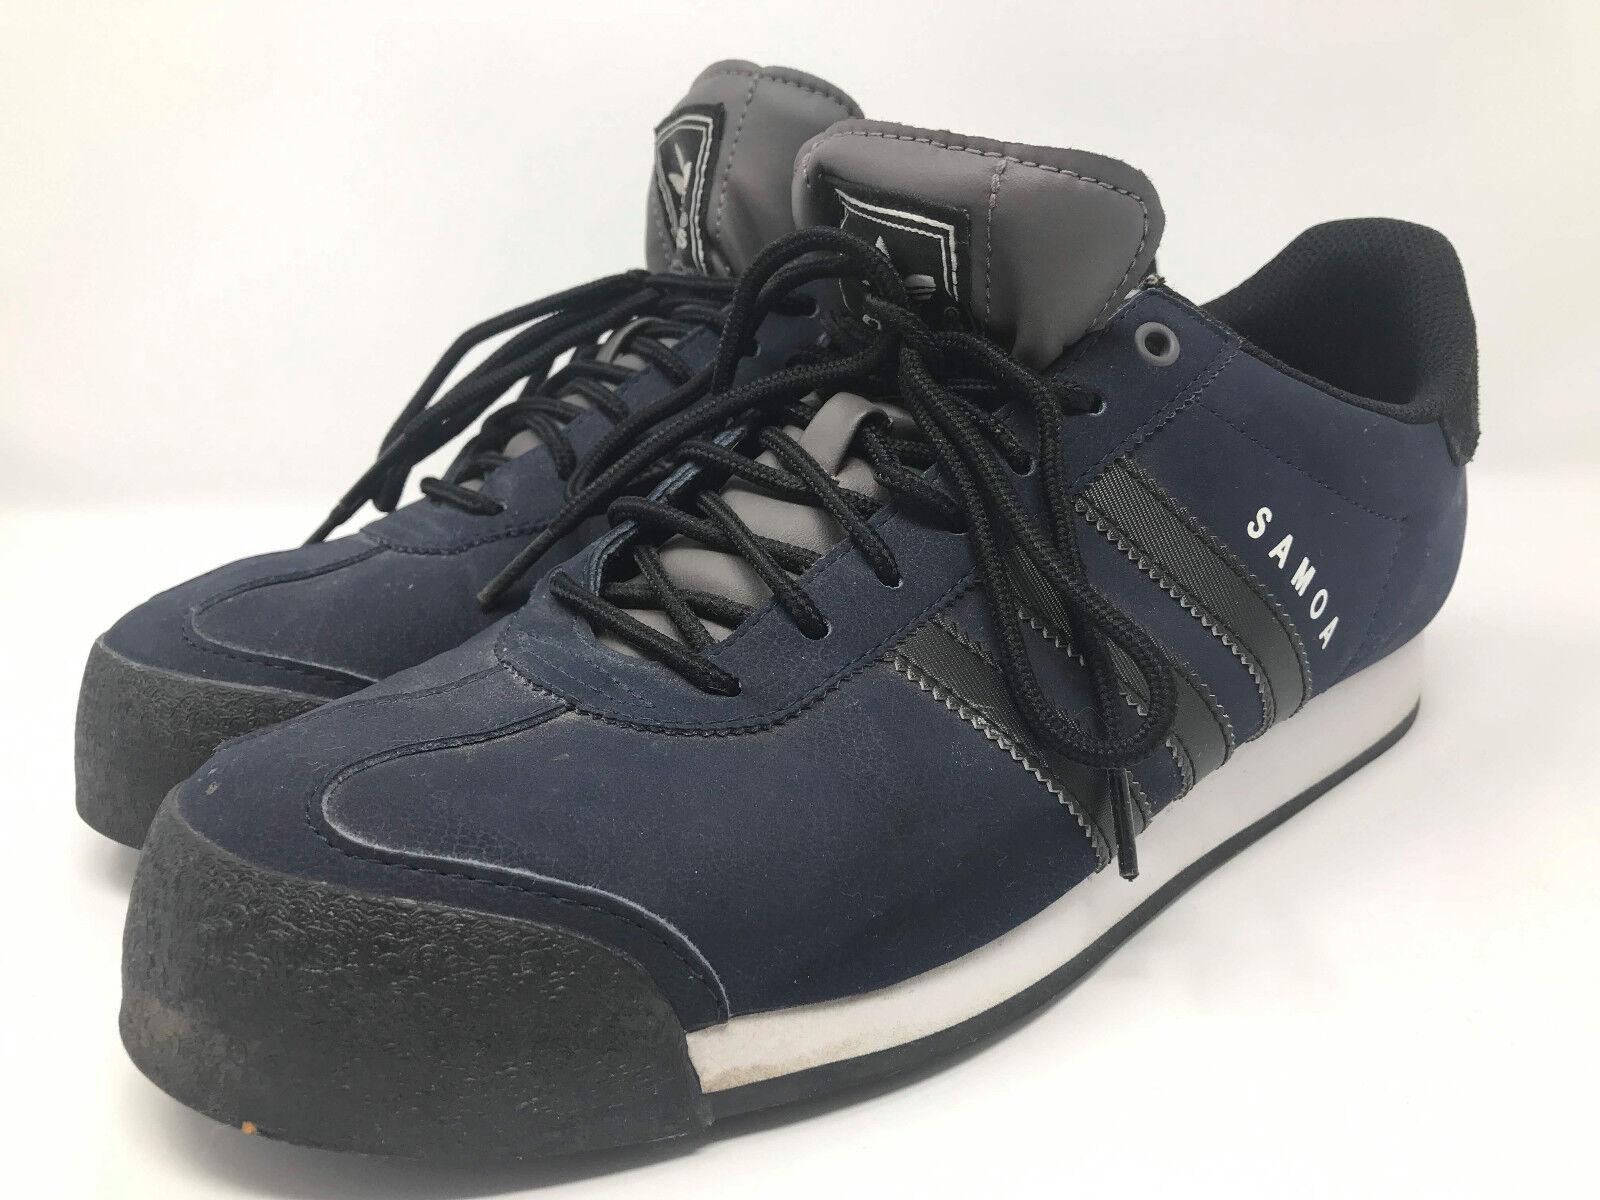 Original Adidas Samoa Blue Navy Black Men's Sneakers Shoes Size 10.5